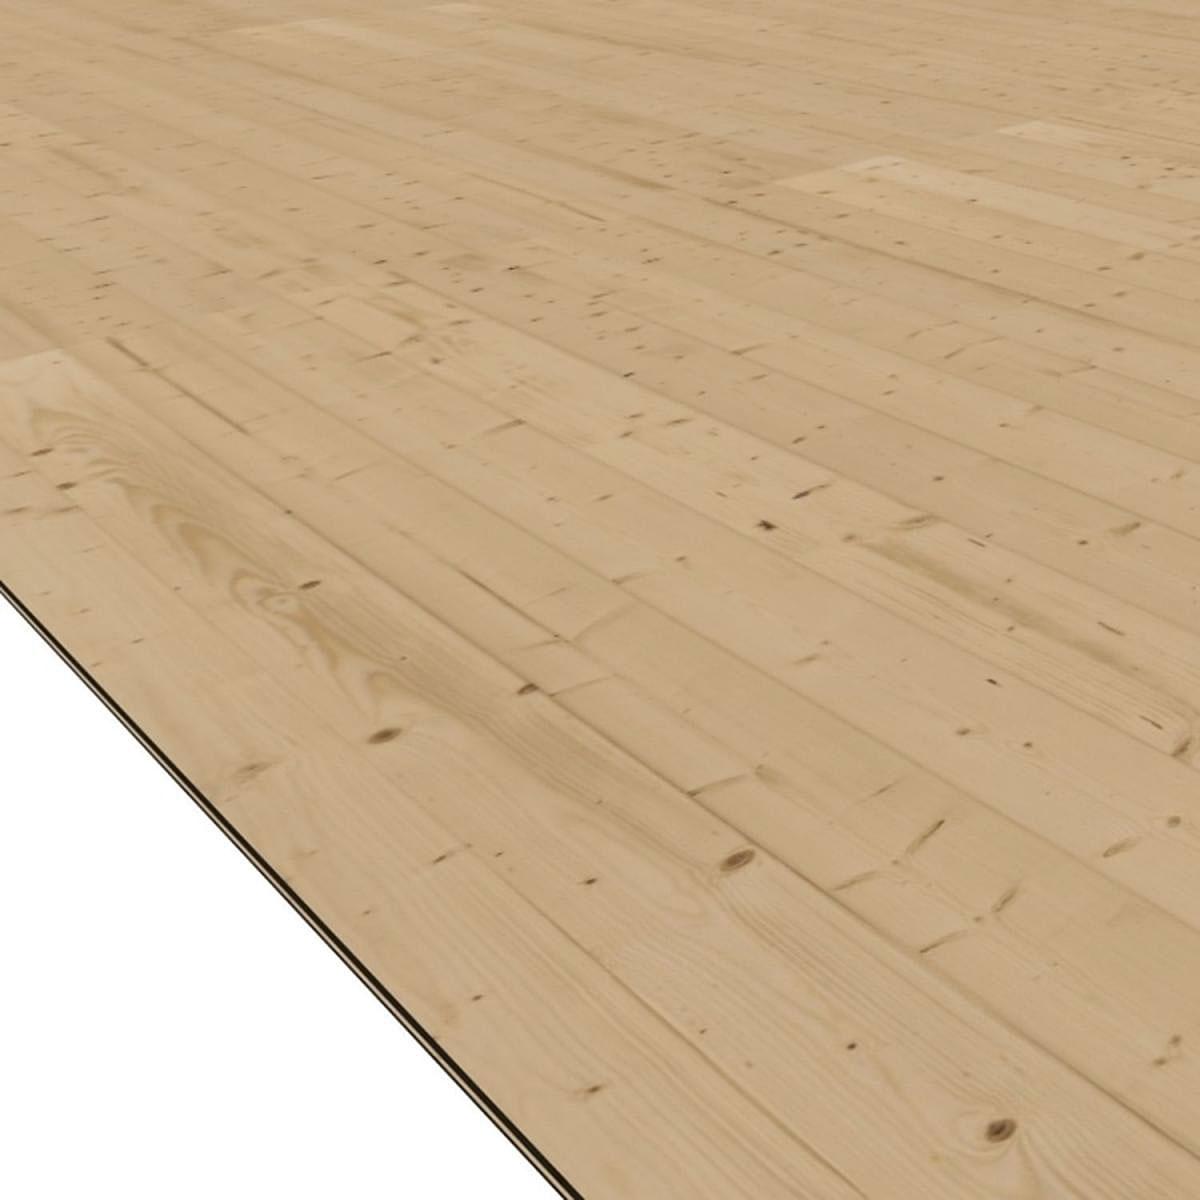 Karibu Fußboden für Gartenhäuser (BxT: 181 x 355 cm)